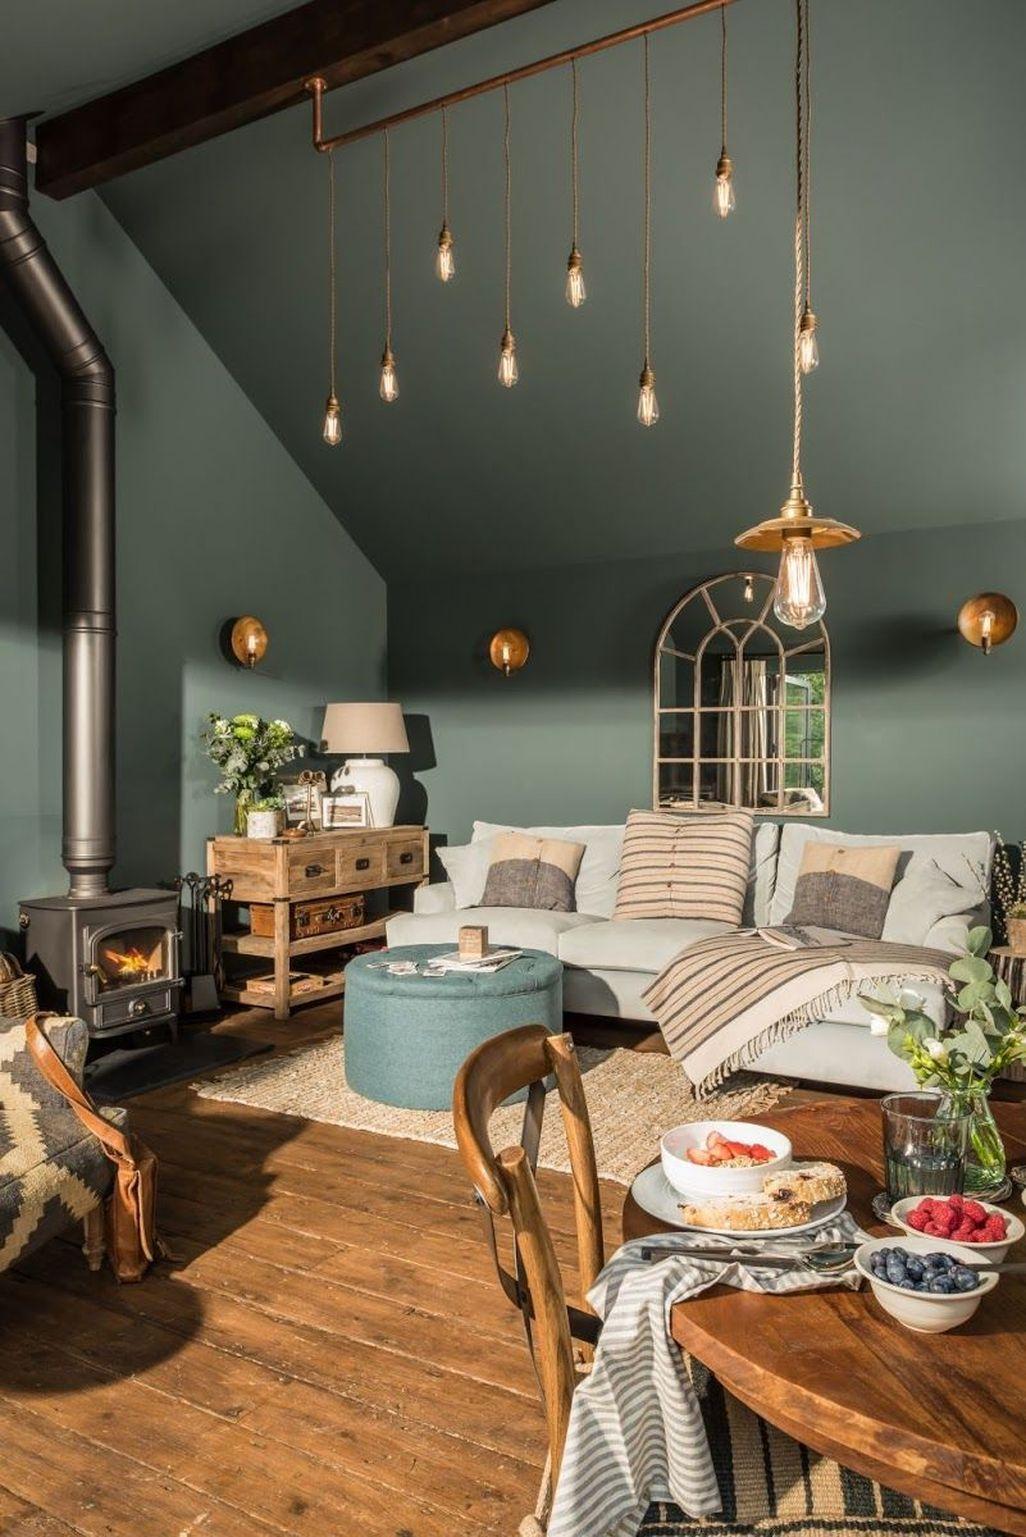 45 Cozy Green Livingroom Ideas #livingroompaintcolorideas